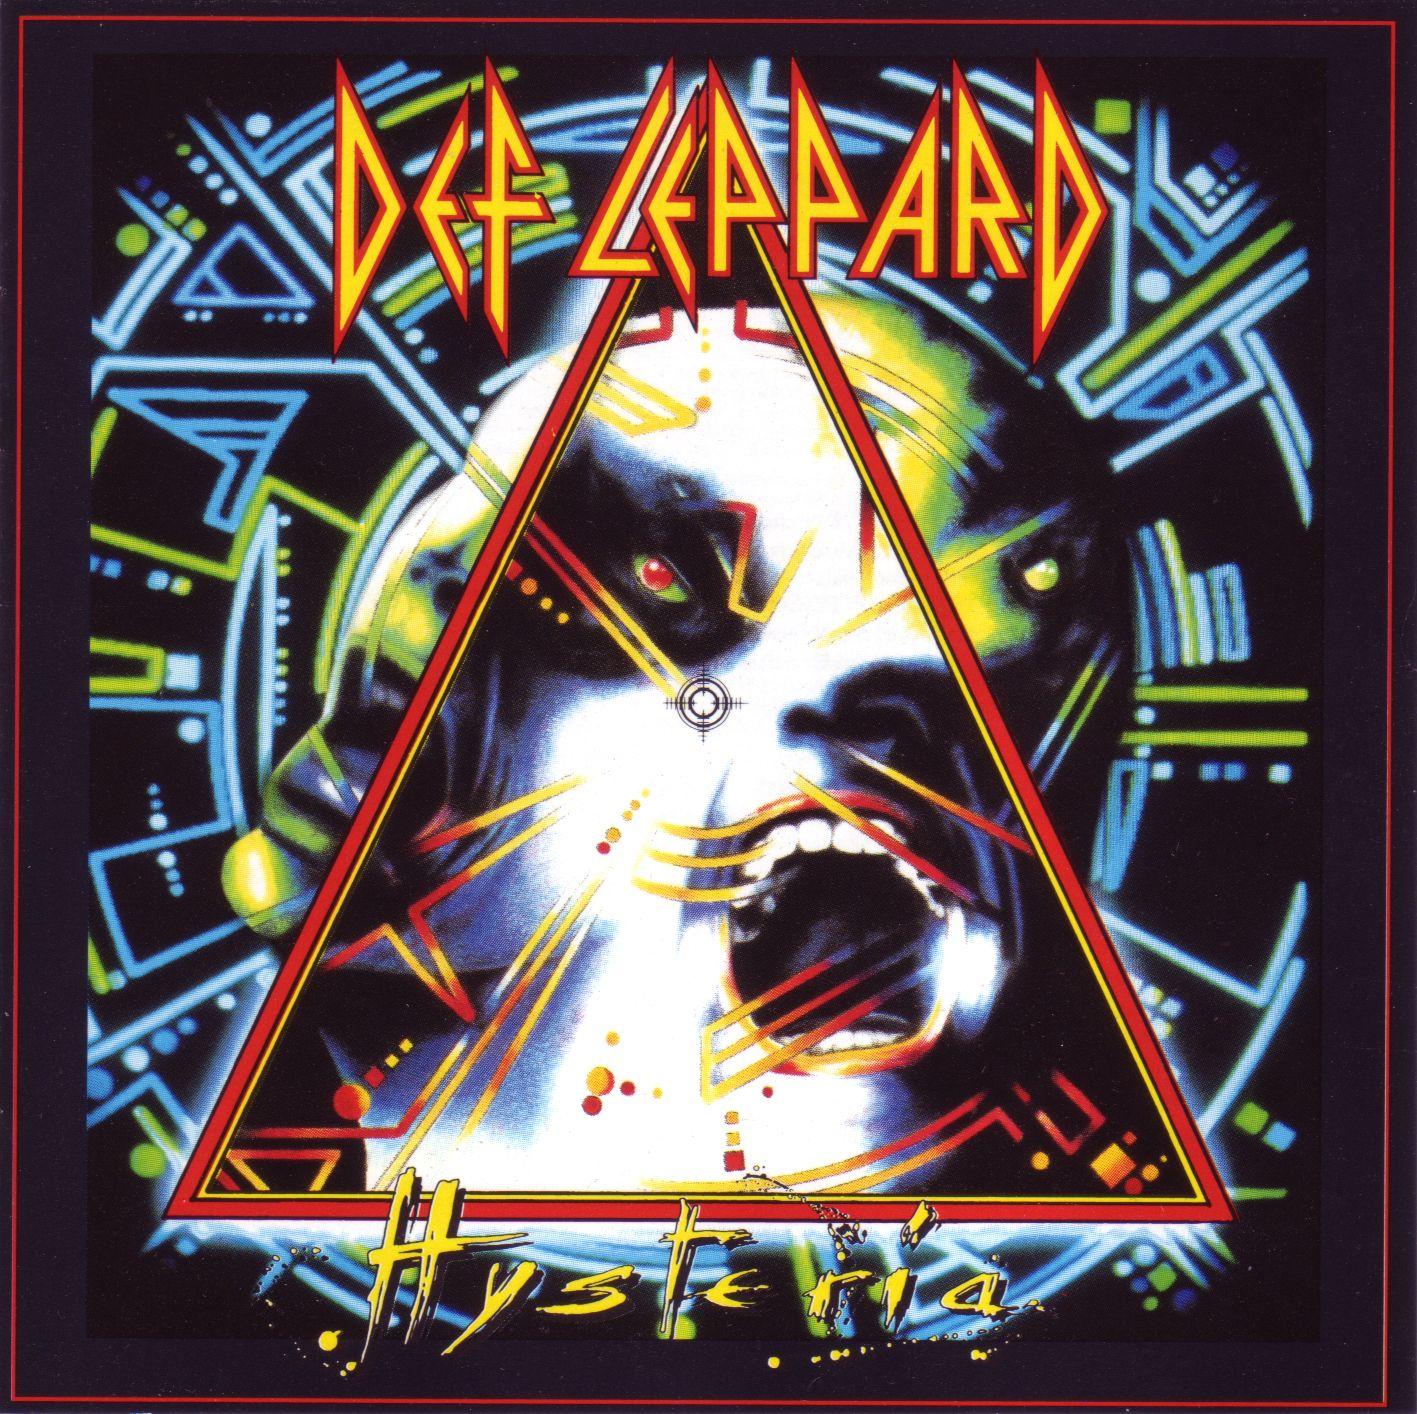 Def Leppard - Hysteria album cover